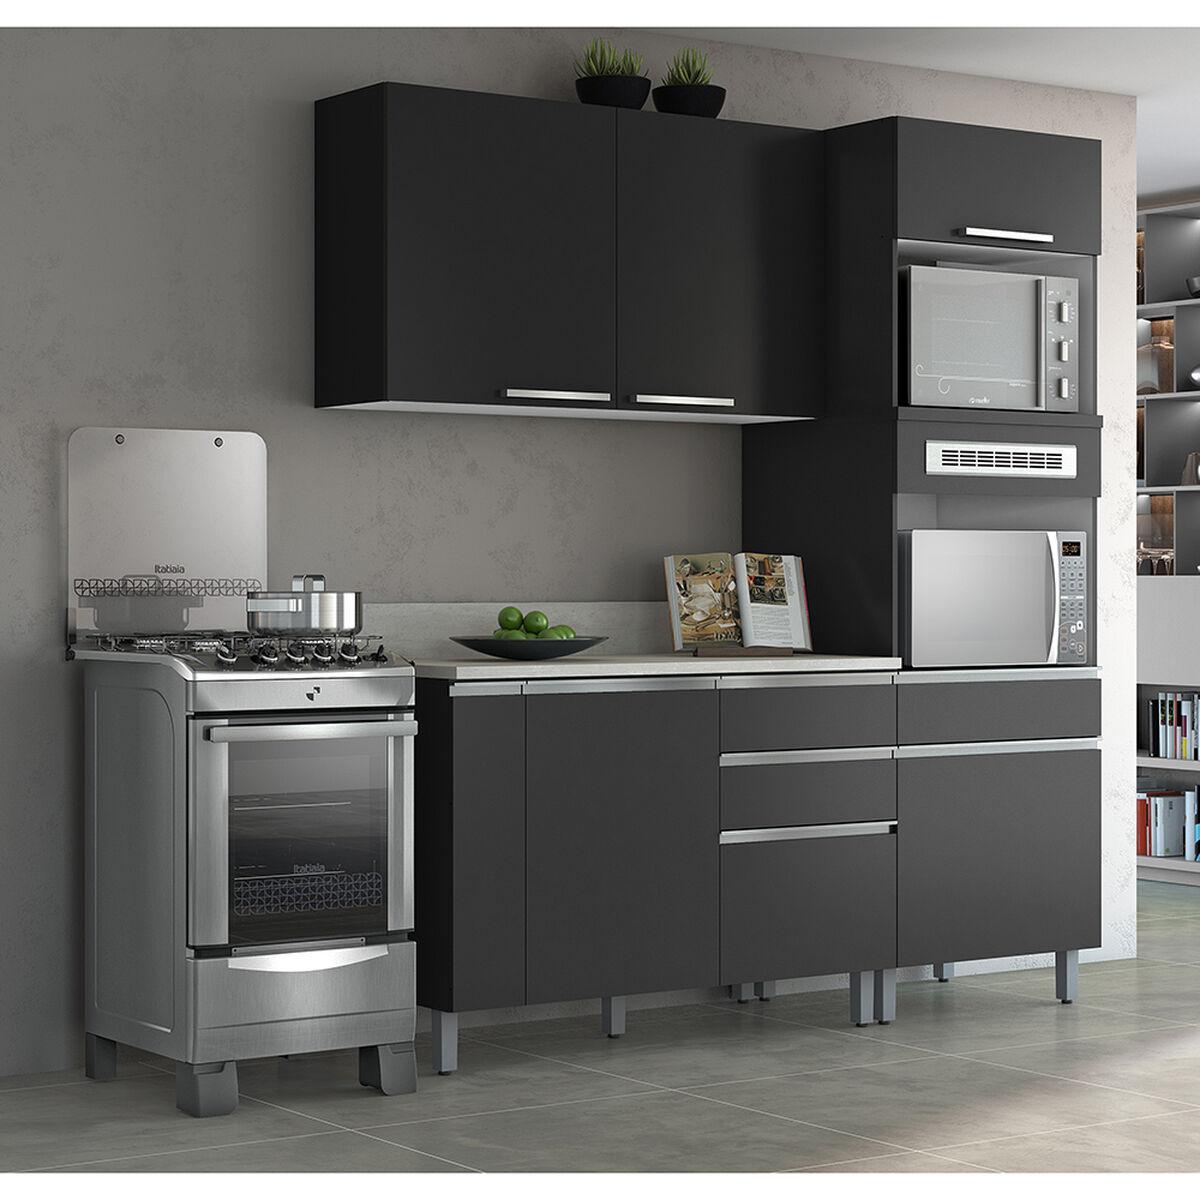 Mueble de Cocina Glory Negro 4 Puertas 6 Cajones | laPolar.cl